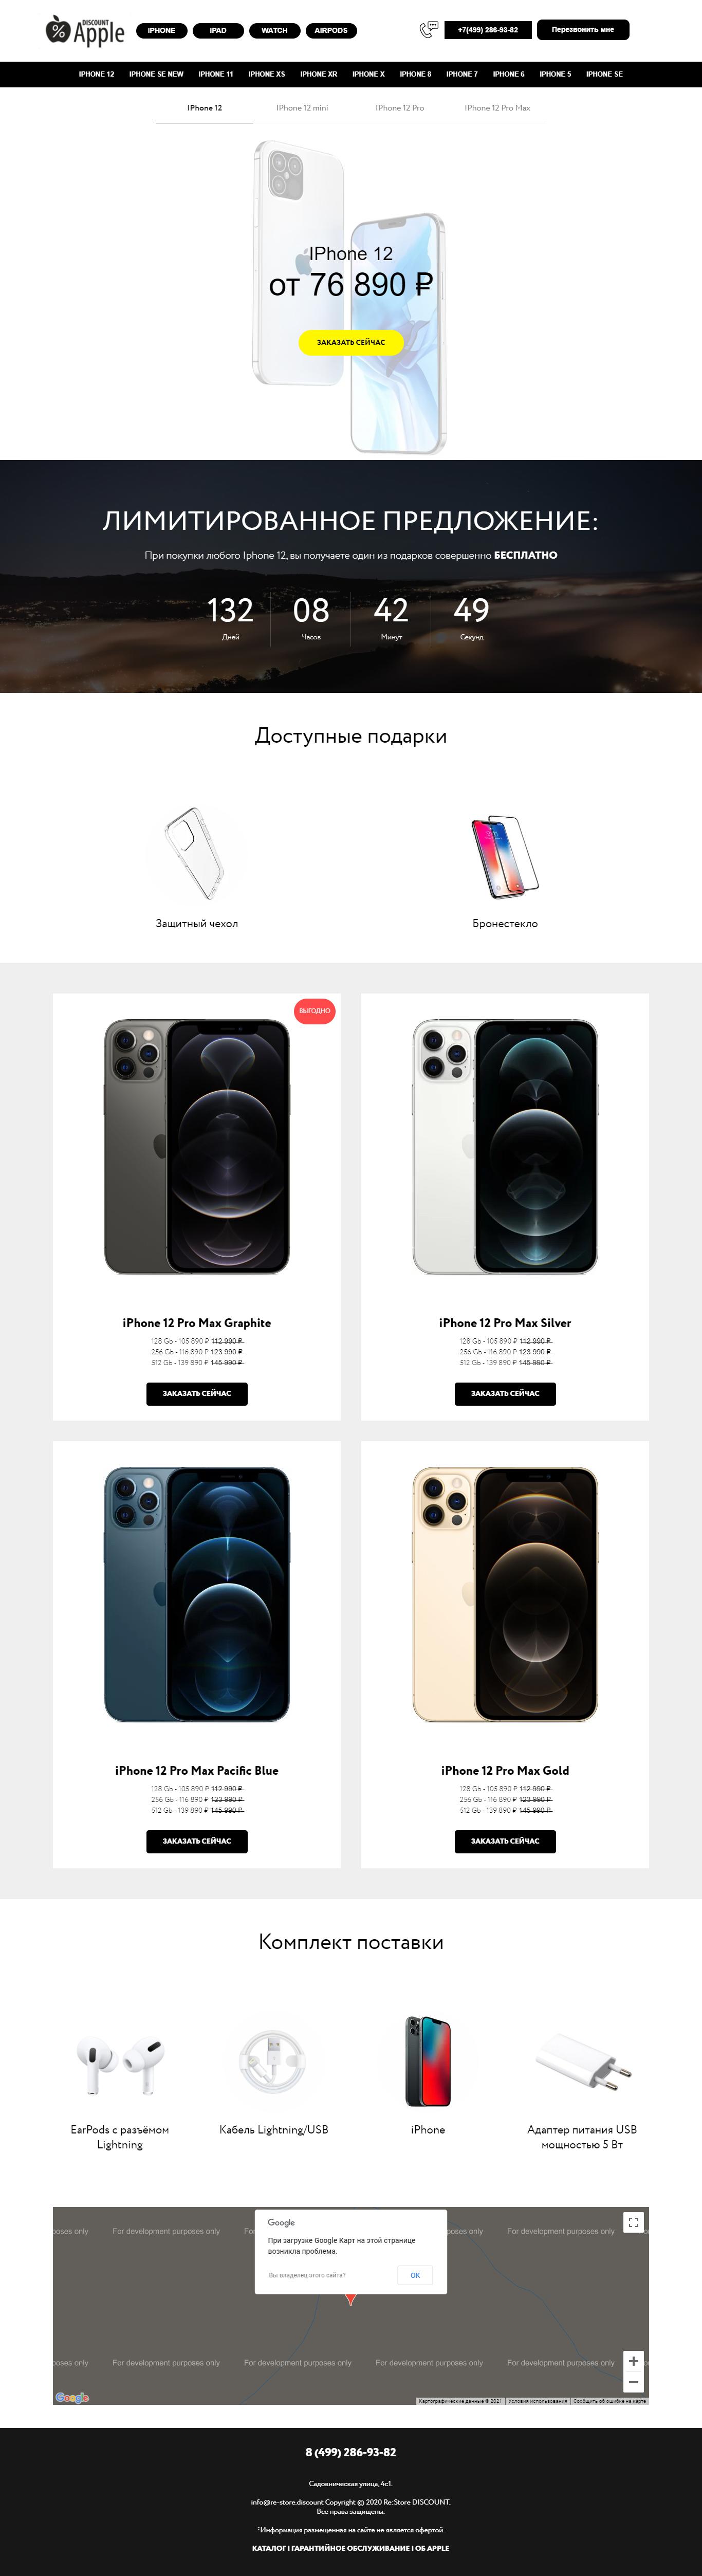 Разработка интернет-магазина по продаже смартфонов Apple